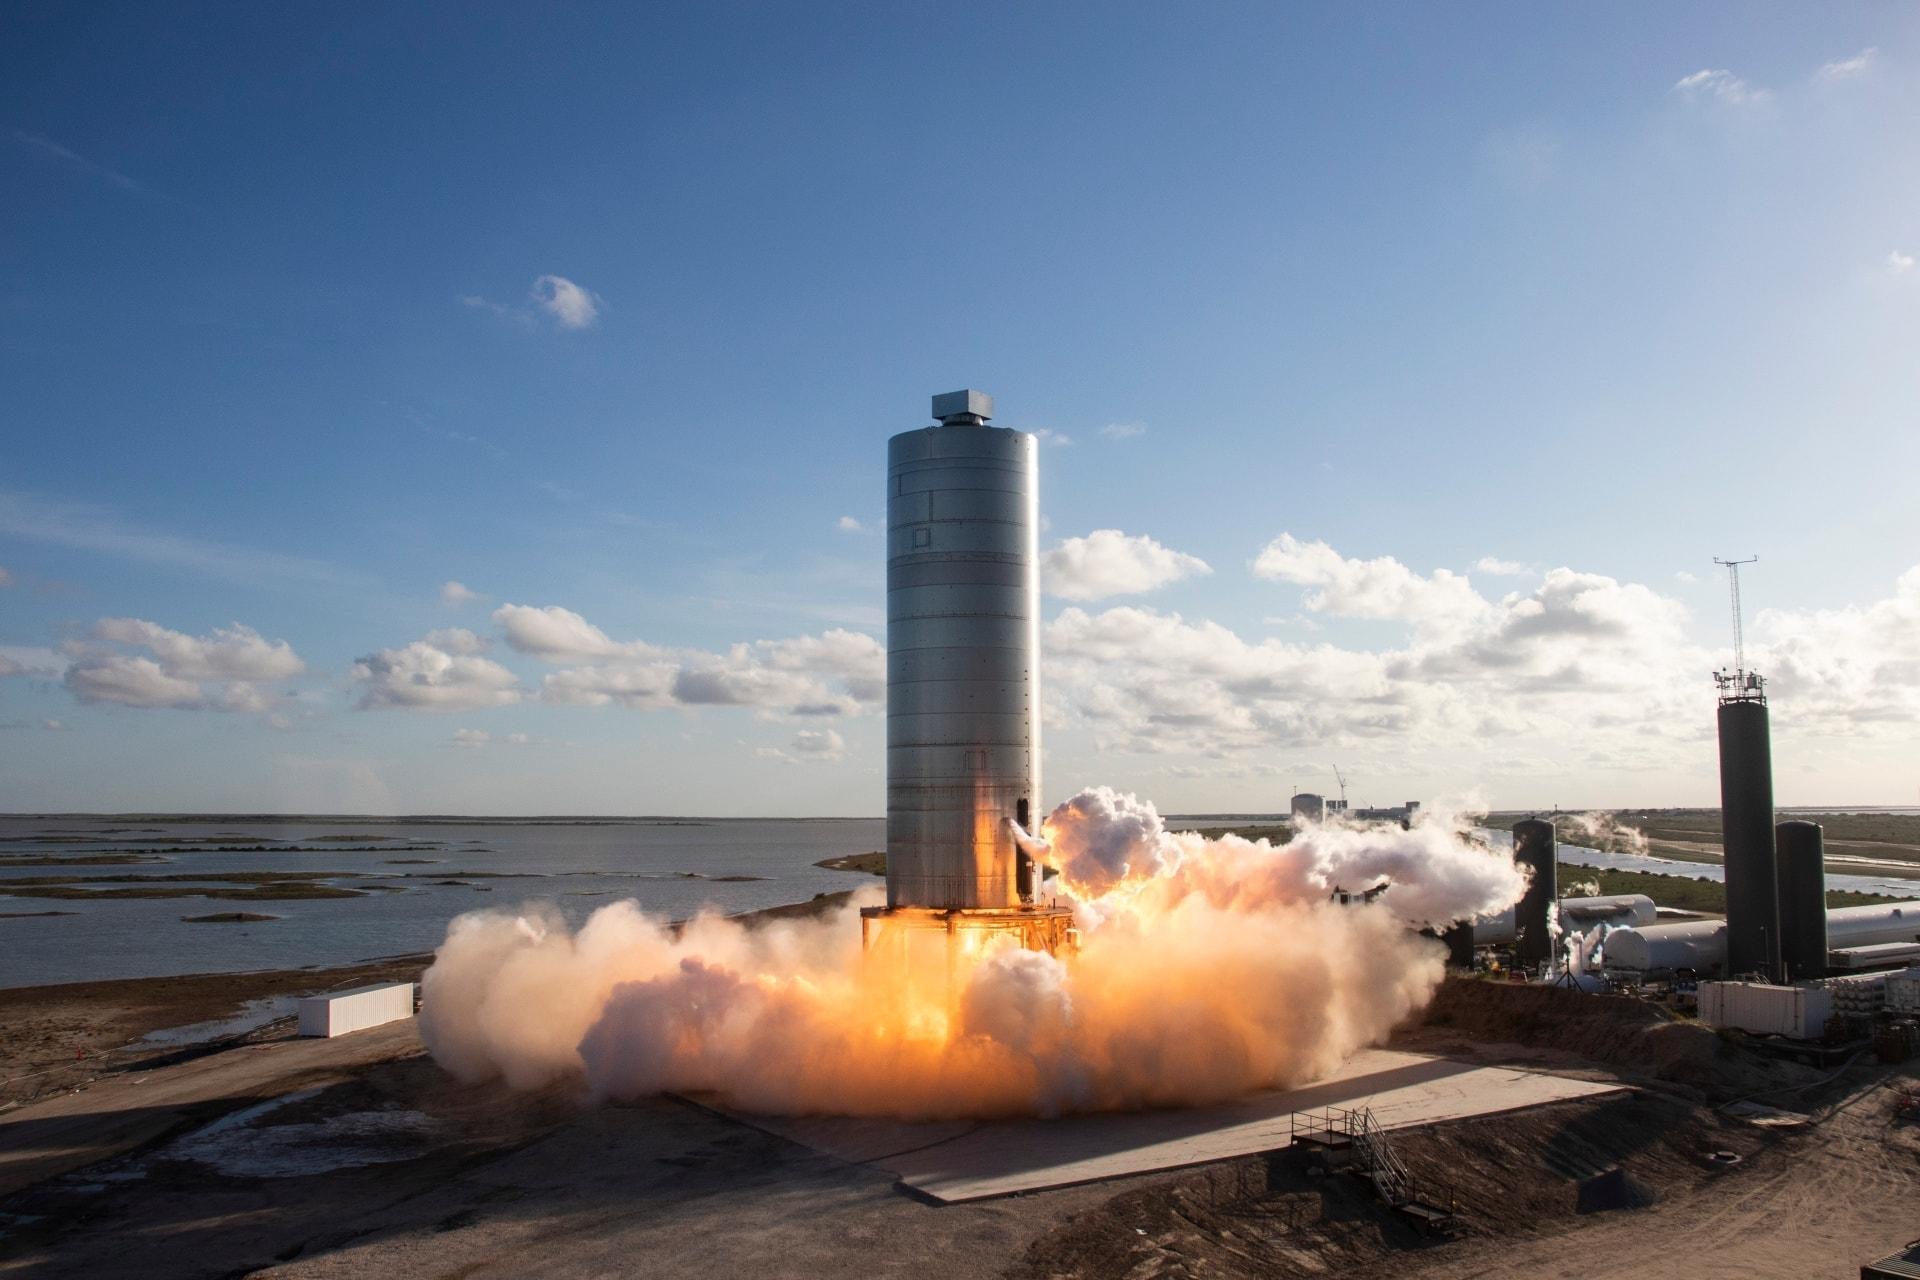 photo spacex starship sn5 launching smoke fire silver cylindrical rocket